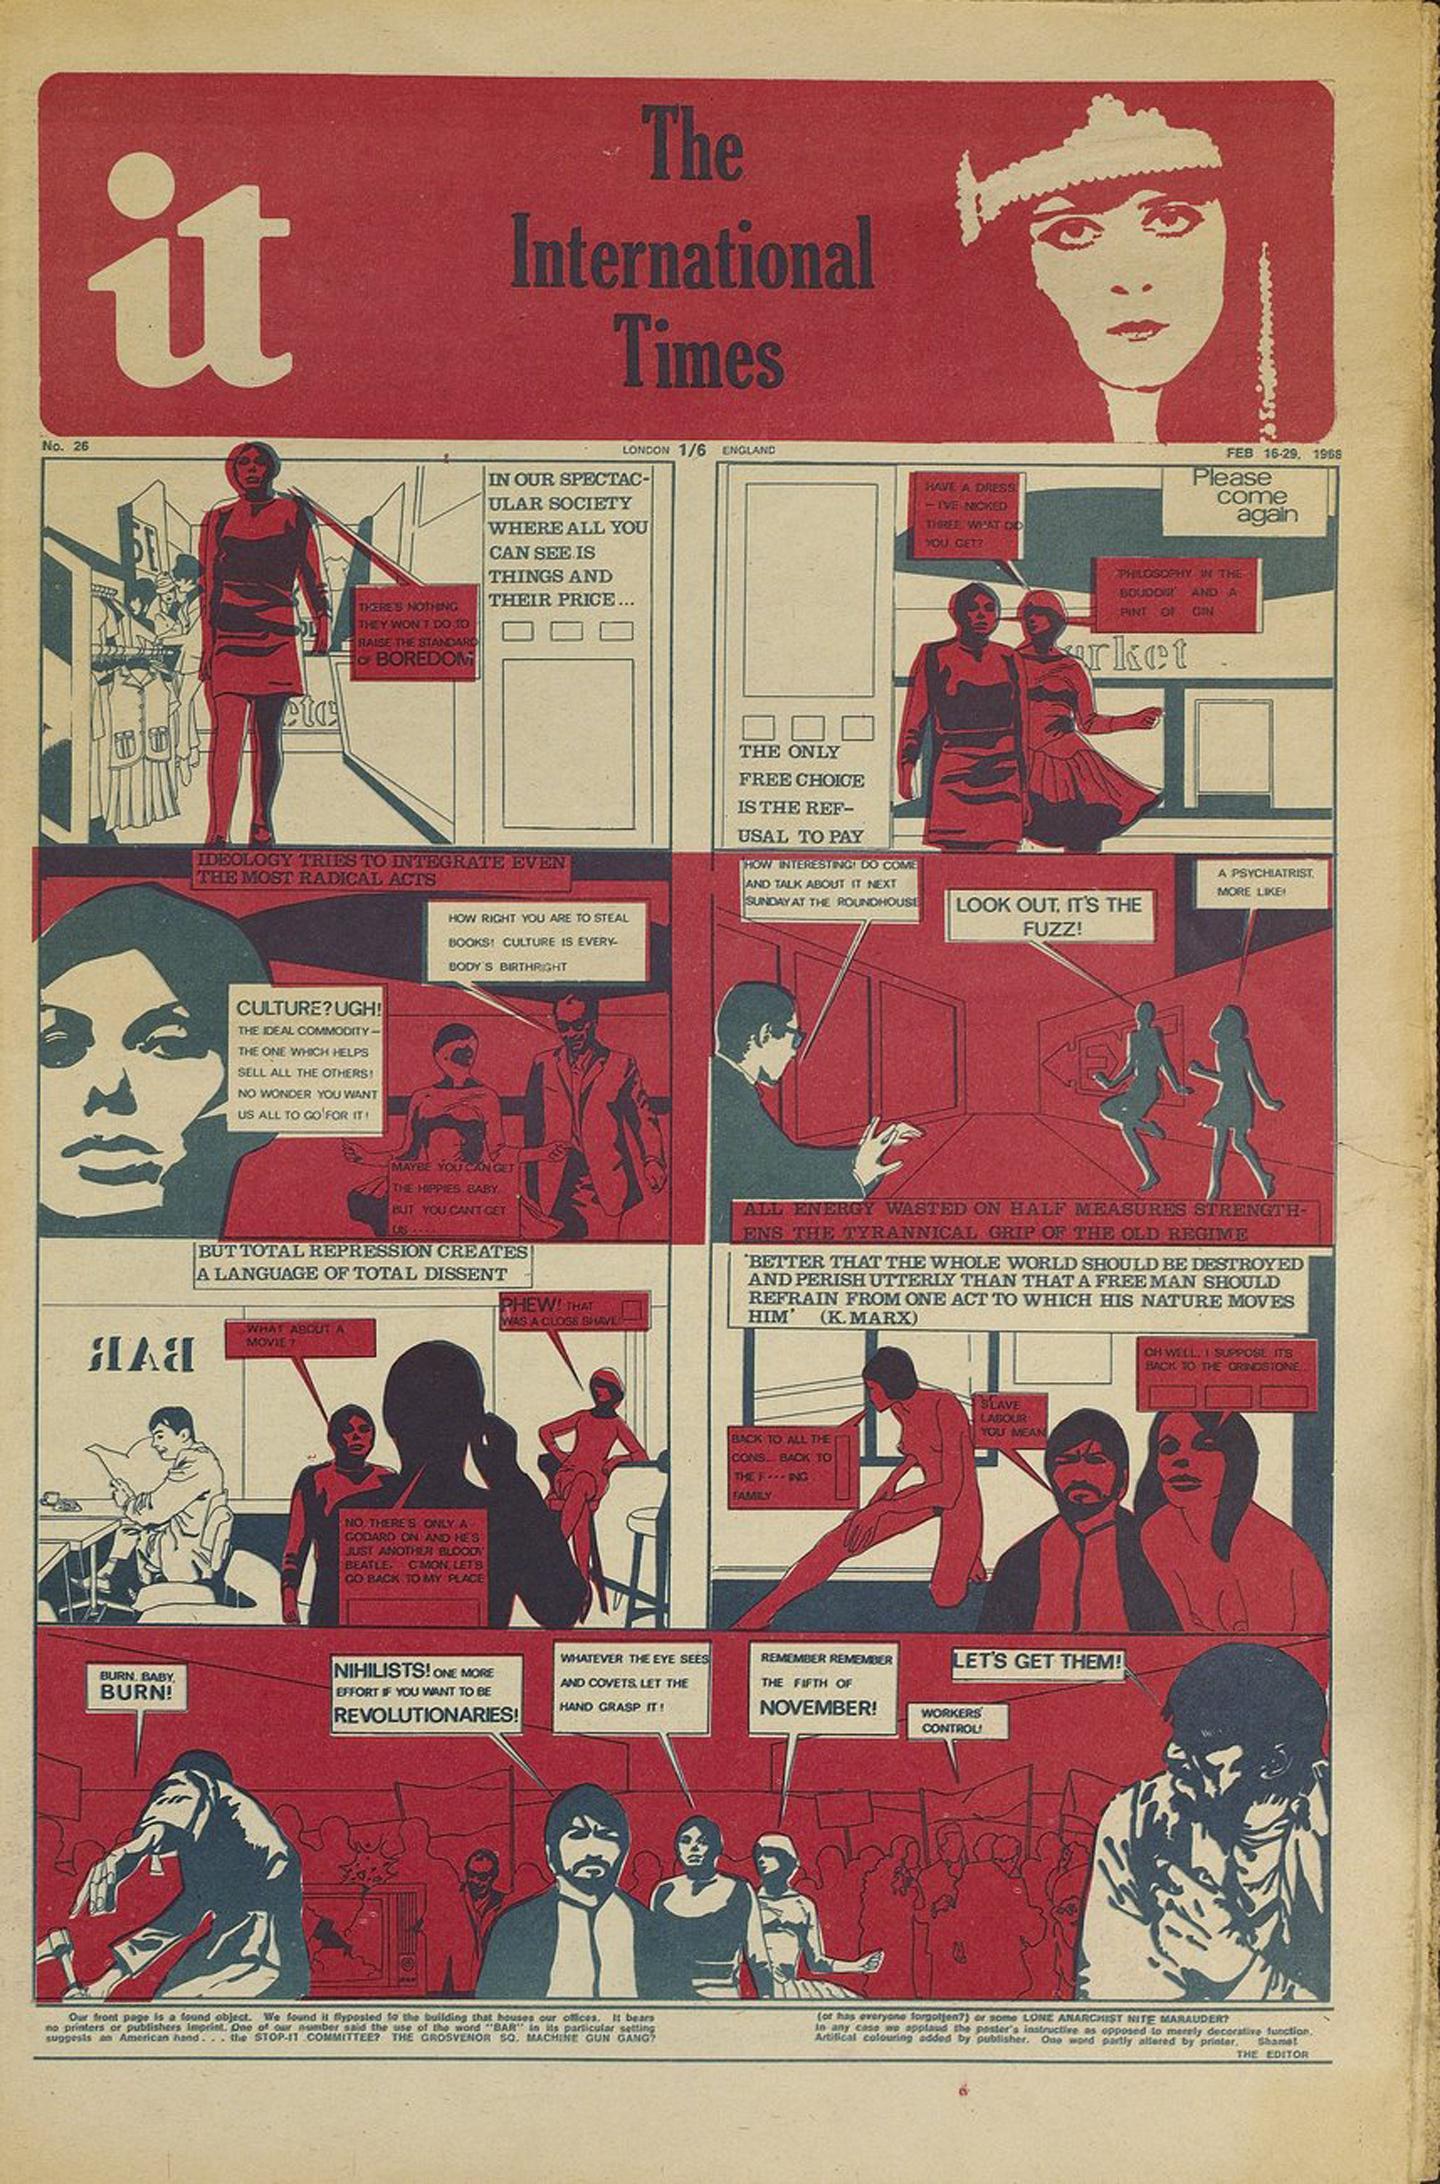 International Times, 1968